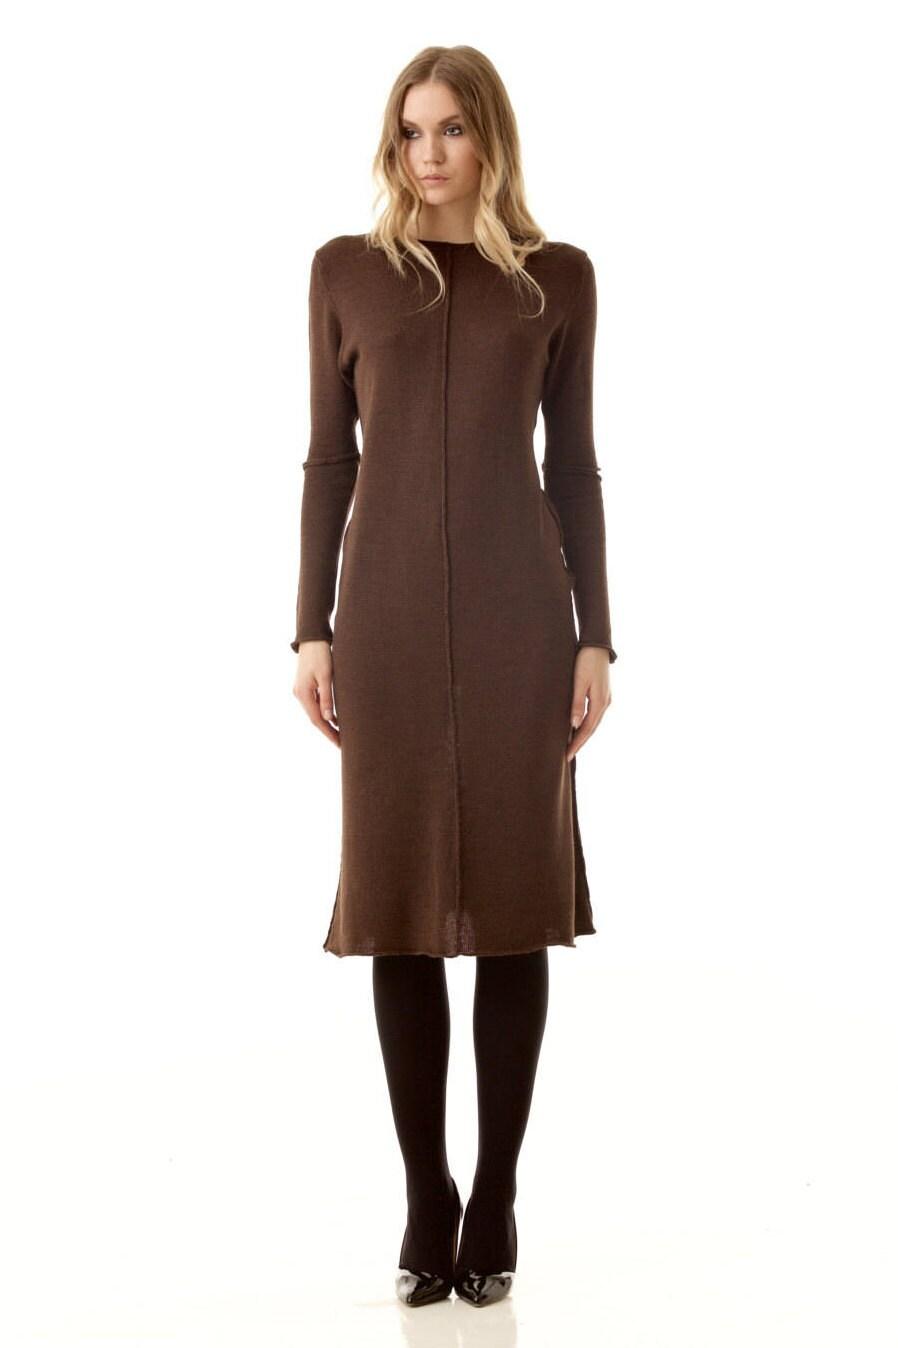 Braune knielange Kleid Merino Wolle gestrickte Kleid